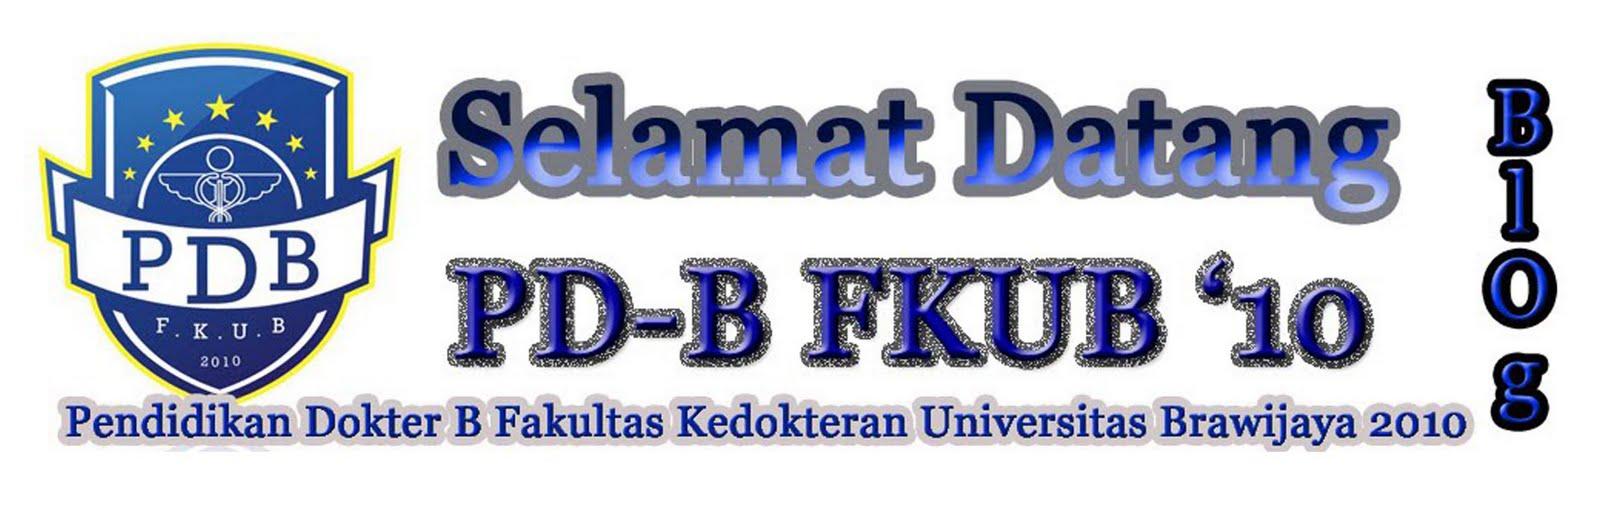 PD-B FKUB 2010